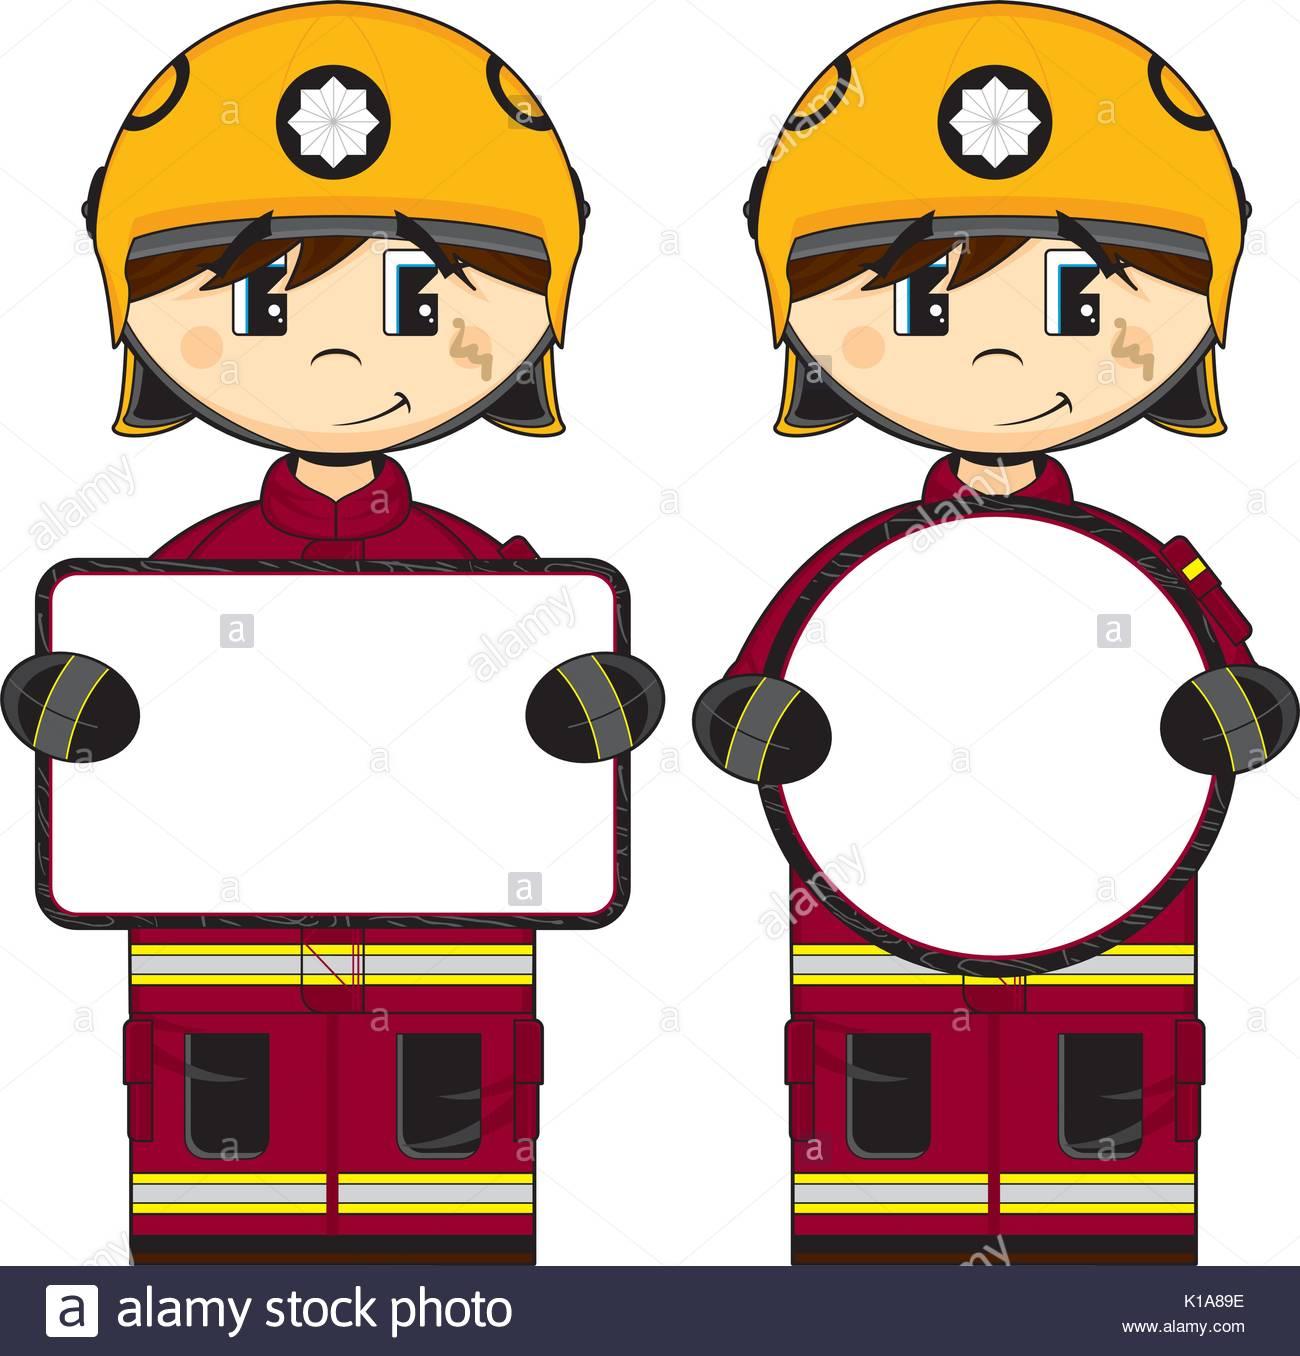 1300x1356 Cartoon Firefighter Stock Photos Amp Cartoon Firefighter Stock